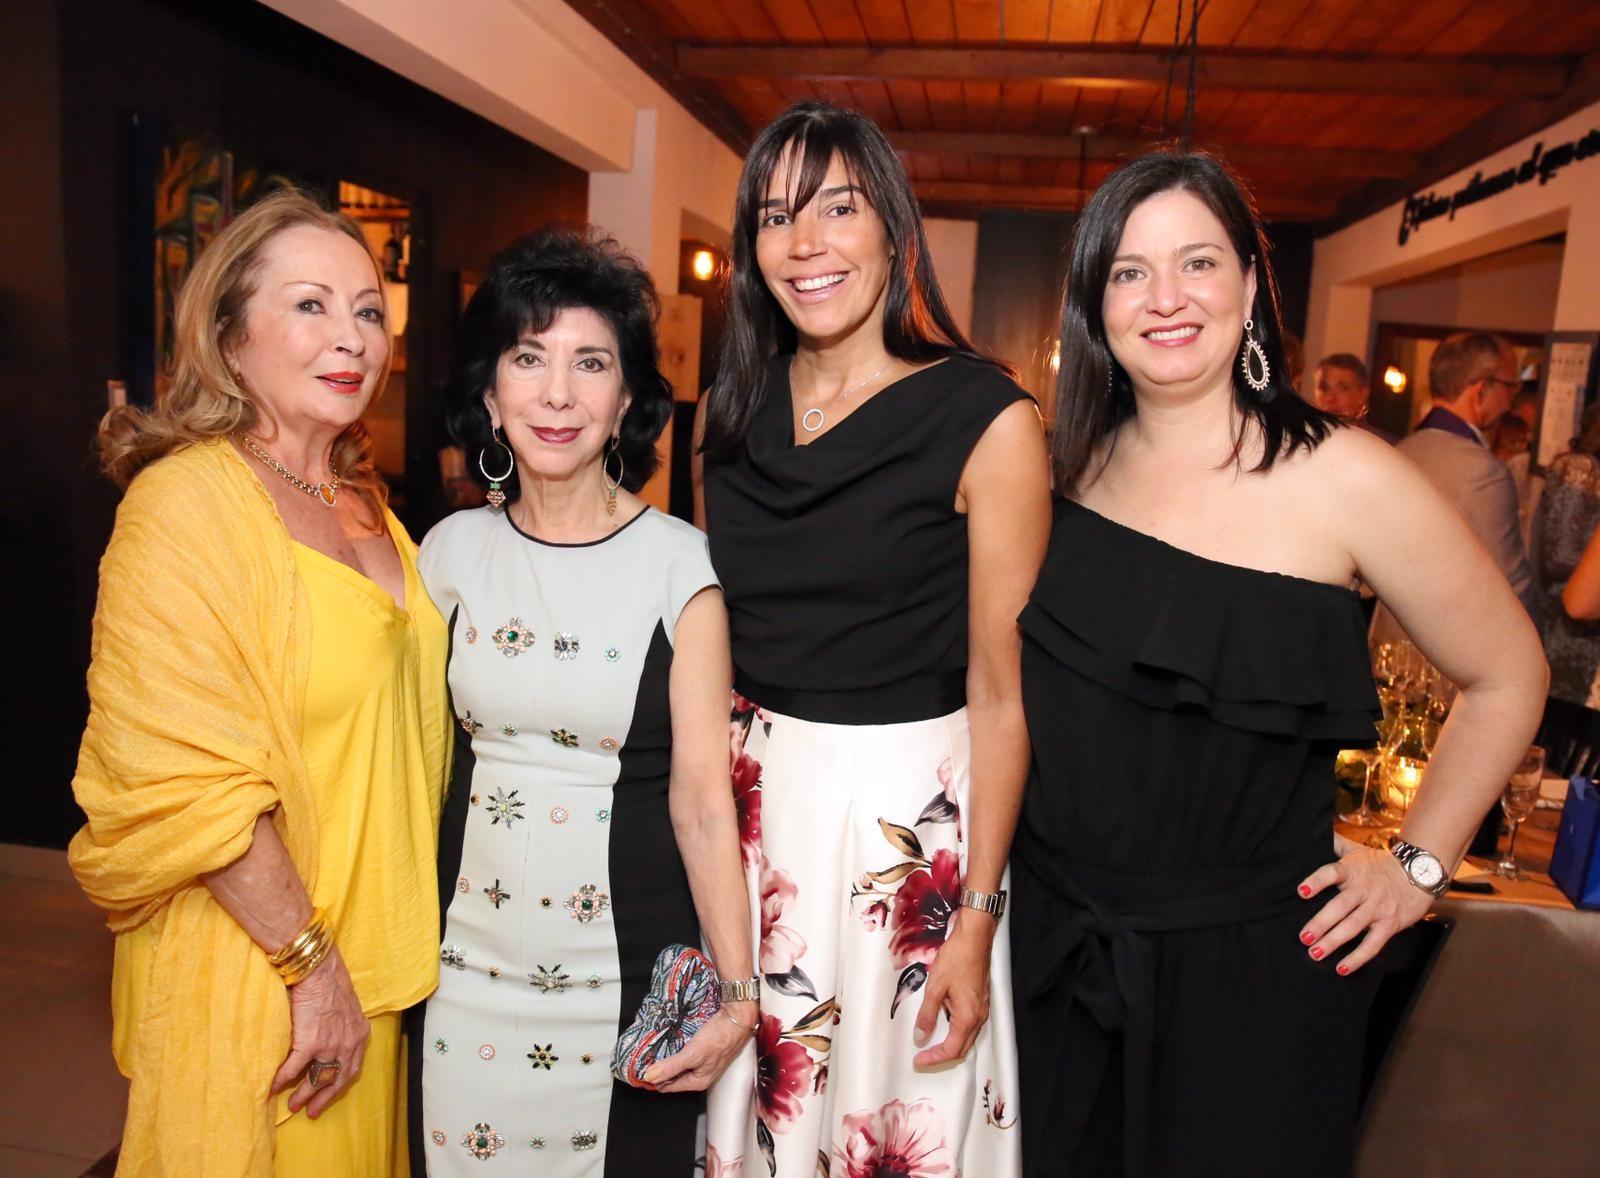 Tensy Llavat, Margarita Serapión, Gina Méndez y Maite Oronoz. Foto suministrada.